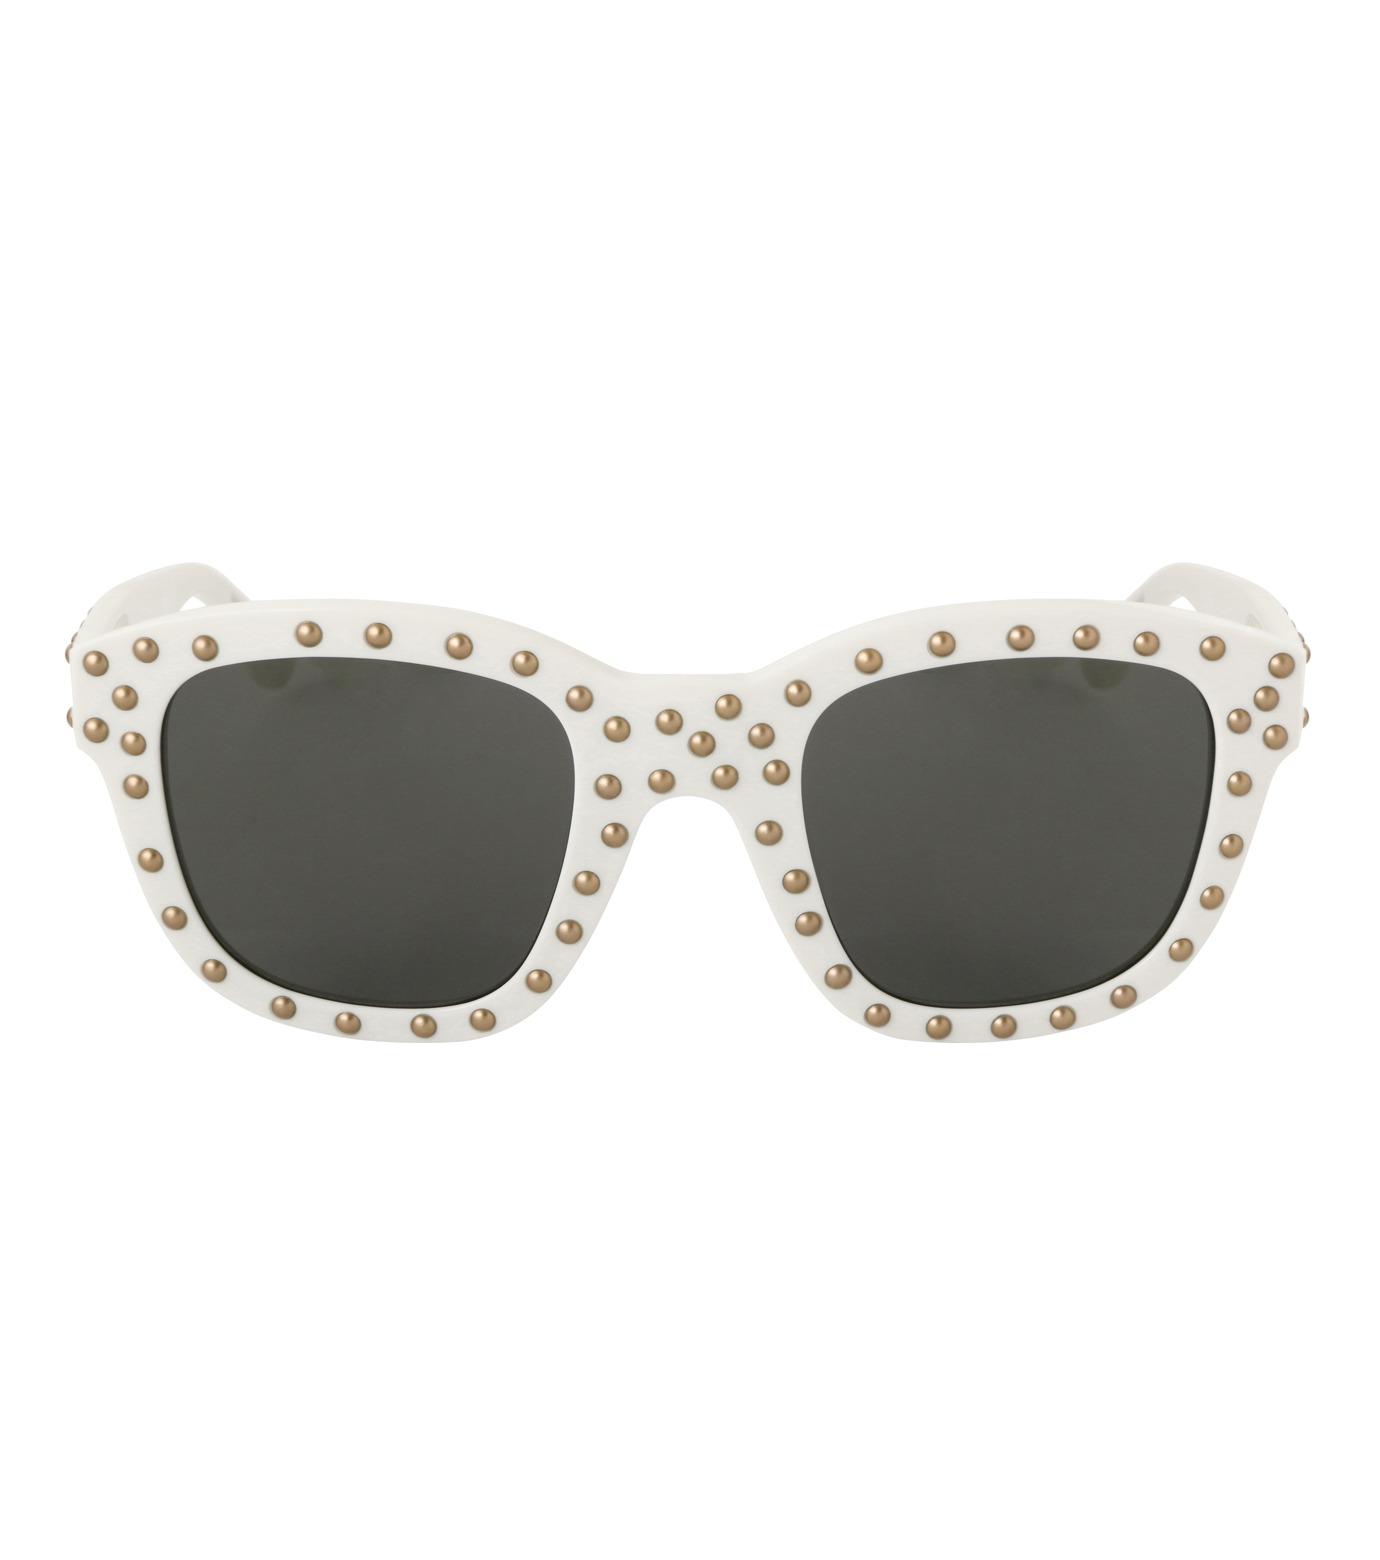 SAINT LAURENT(サンローラン)のSL 100 Lou Studded-WHITE(アイウェア/eyewear)-420137-4 拡大詳細画像3